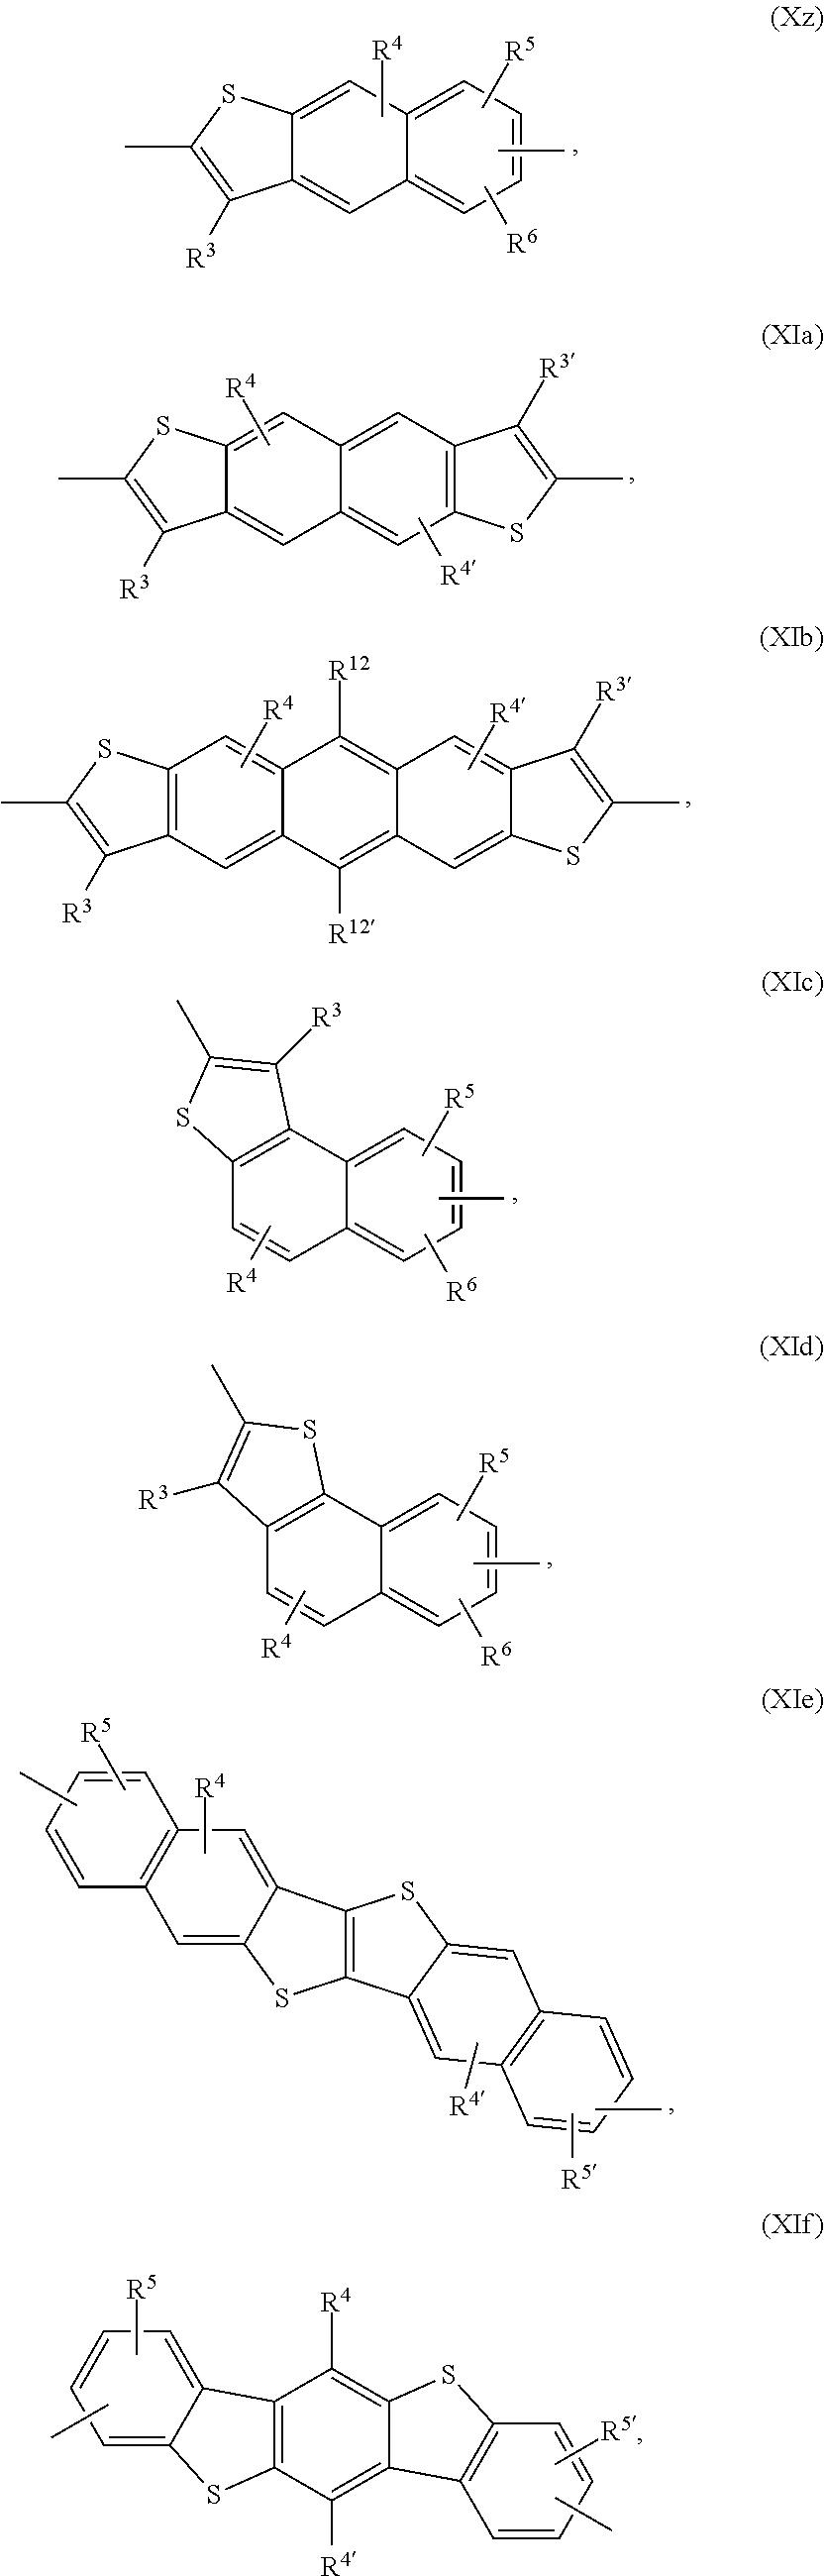 US8796469B2 - Diketopyrrolopyrrole polymers for use in organic